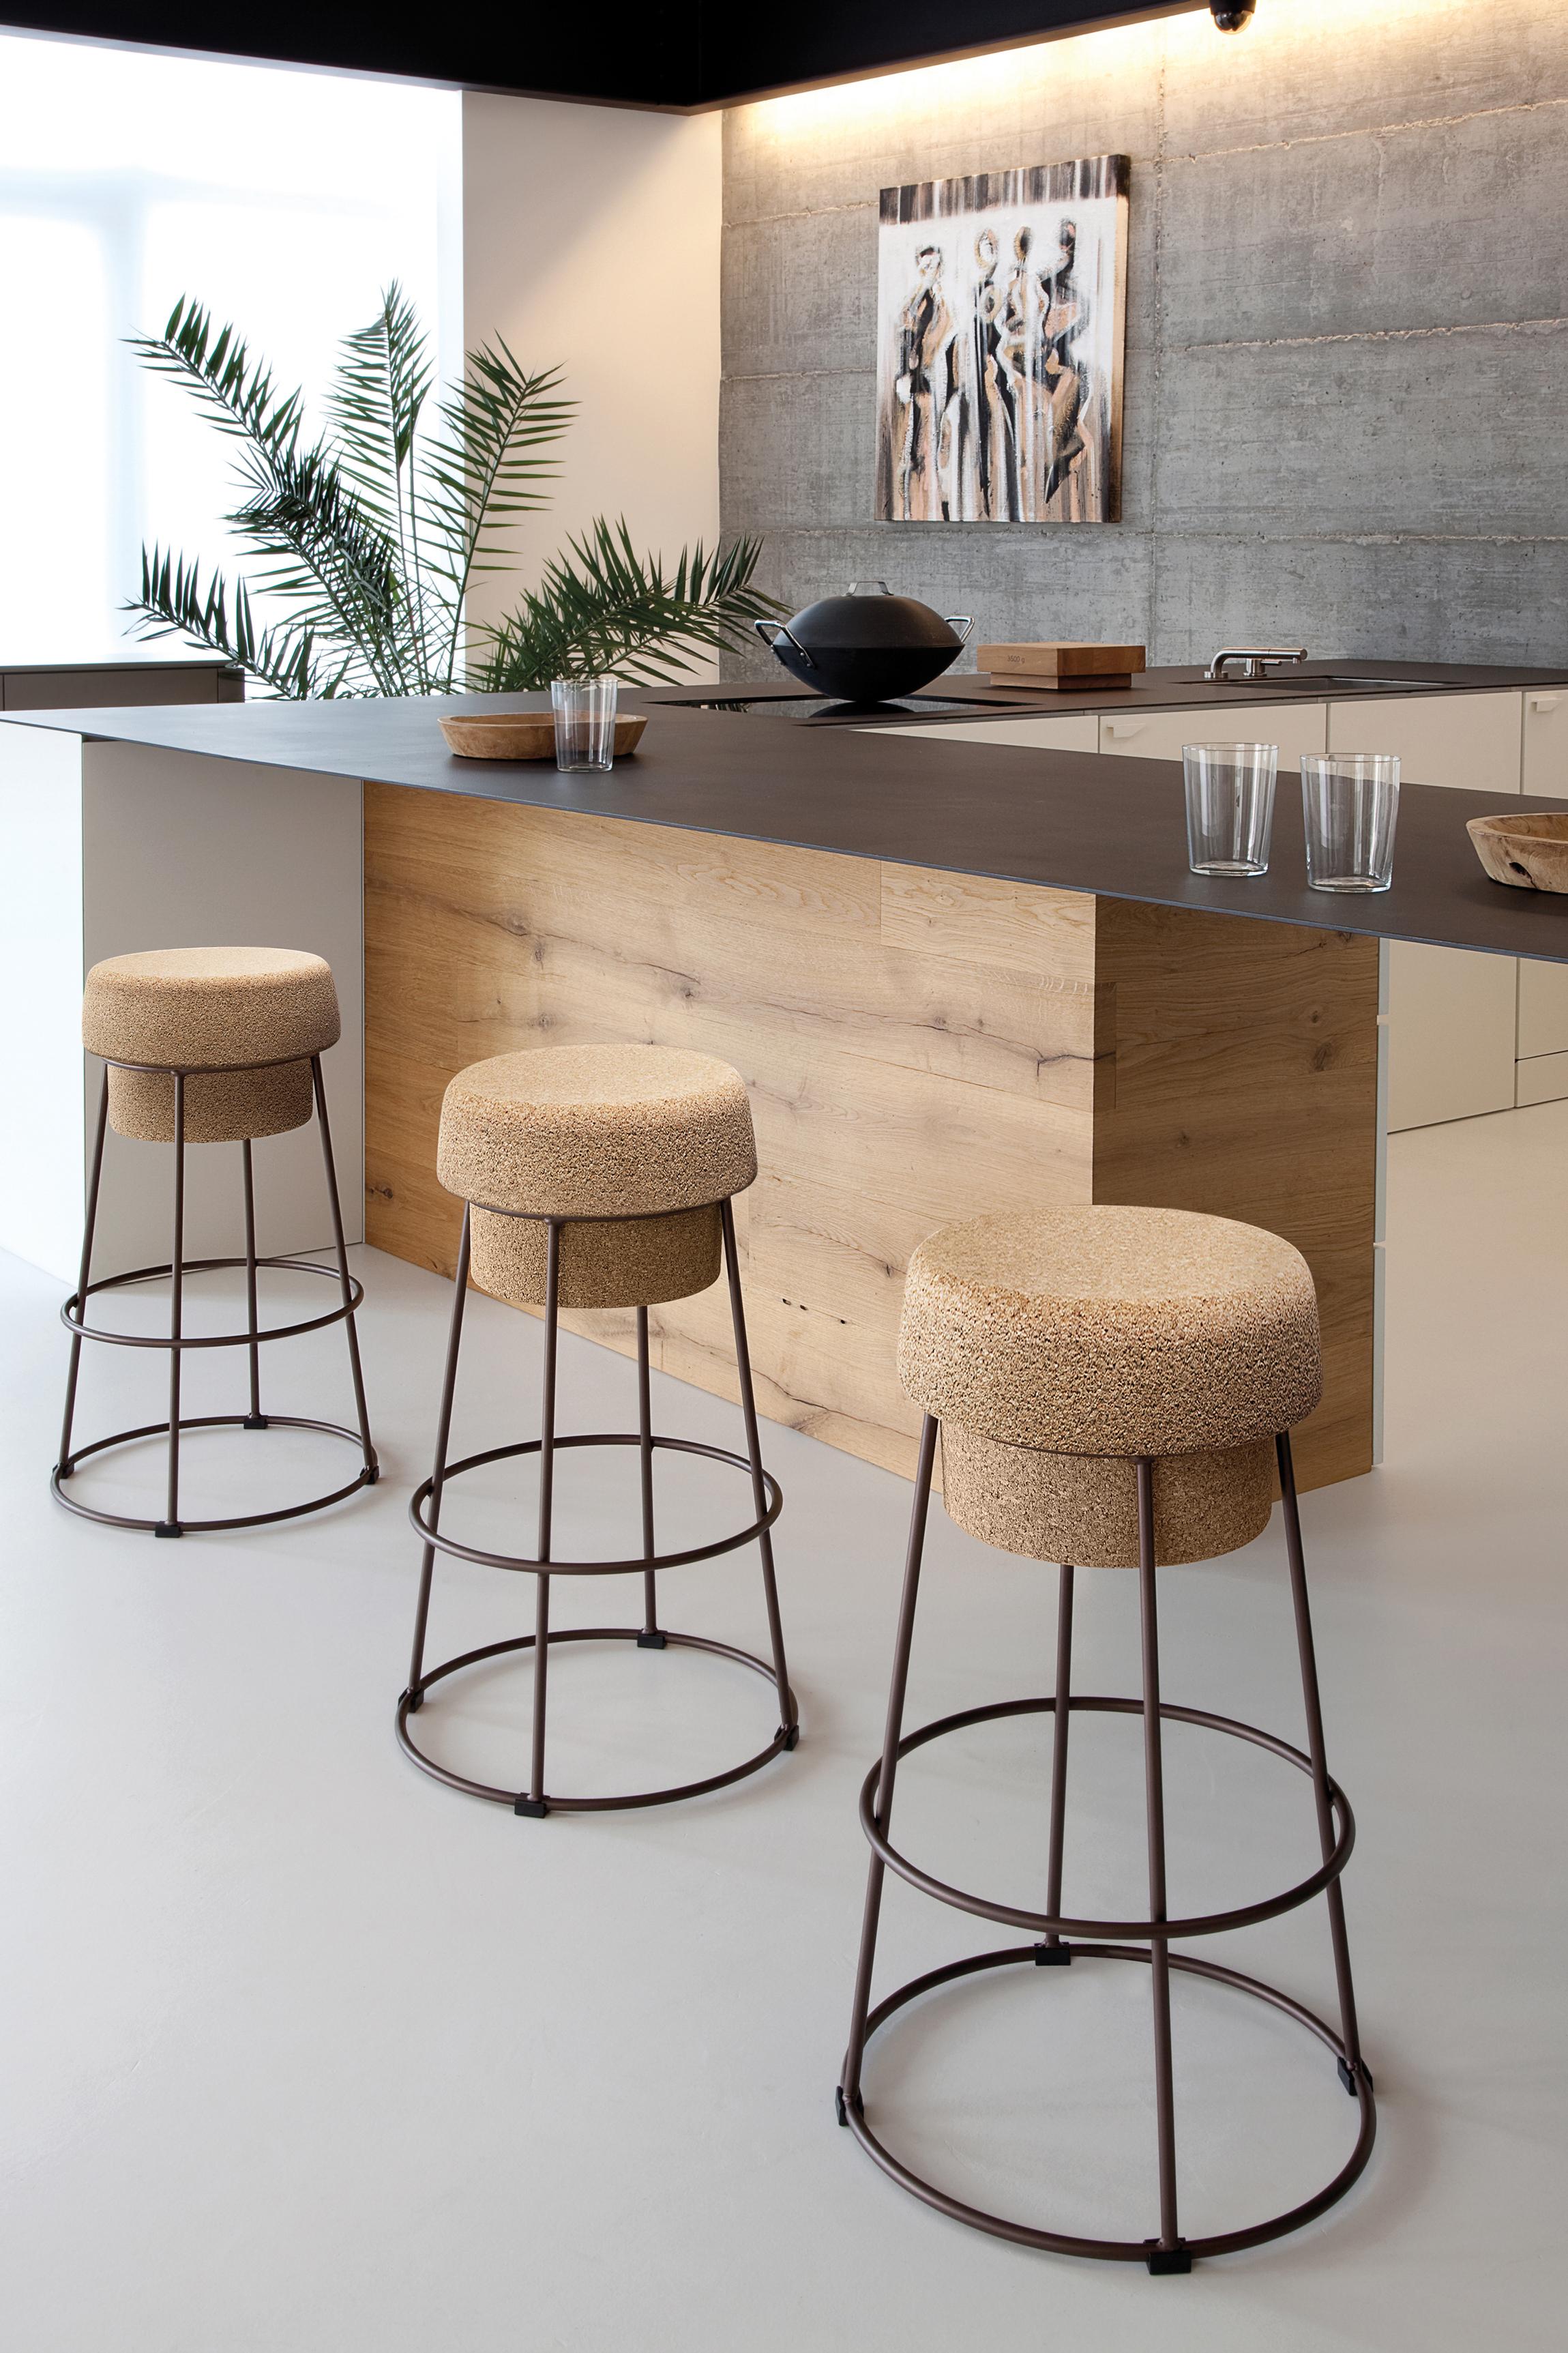 Bouchon-барный стул купить киев